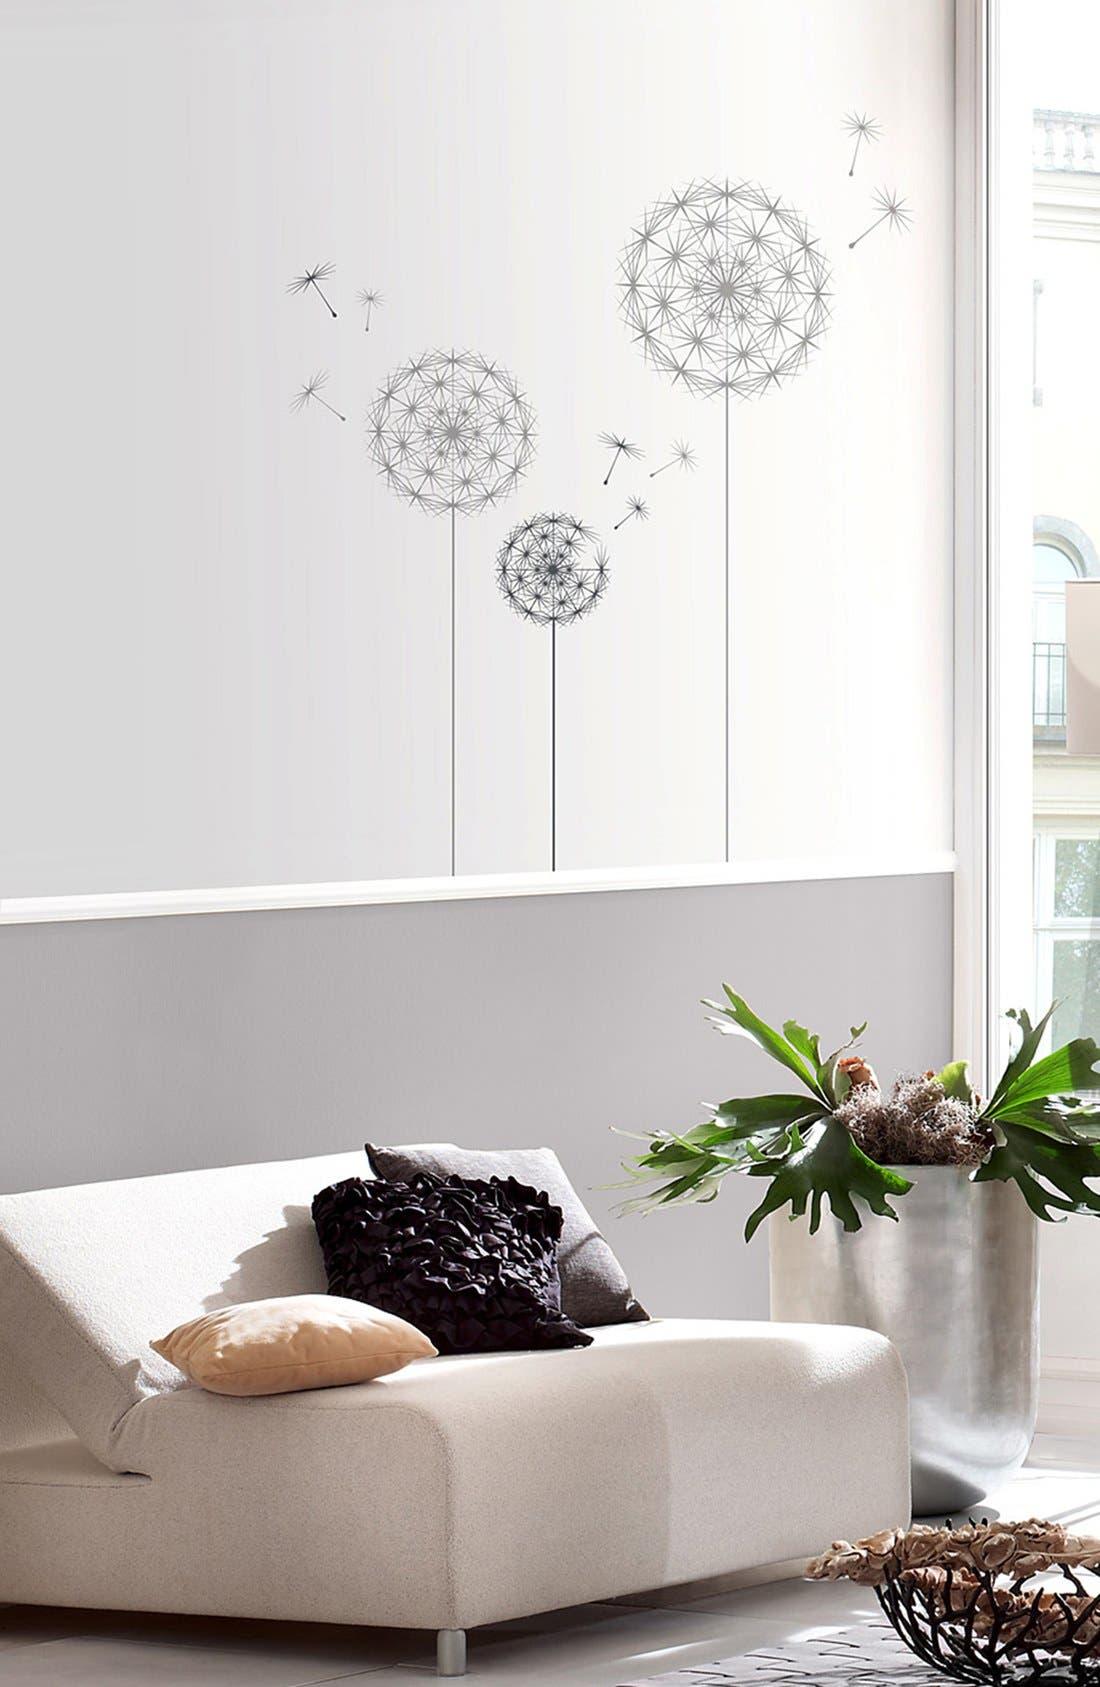 Alternate Image 1 Selected - Wallpops 'Dandelion' Wall Art